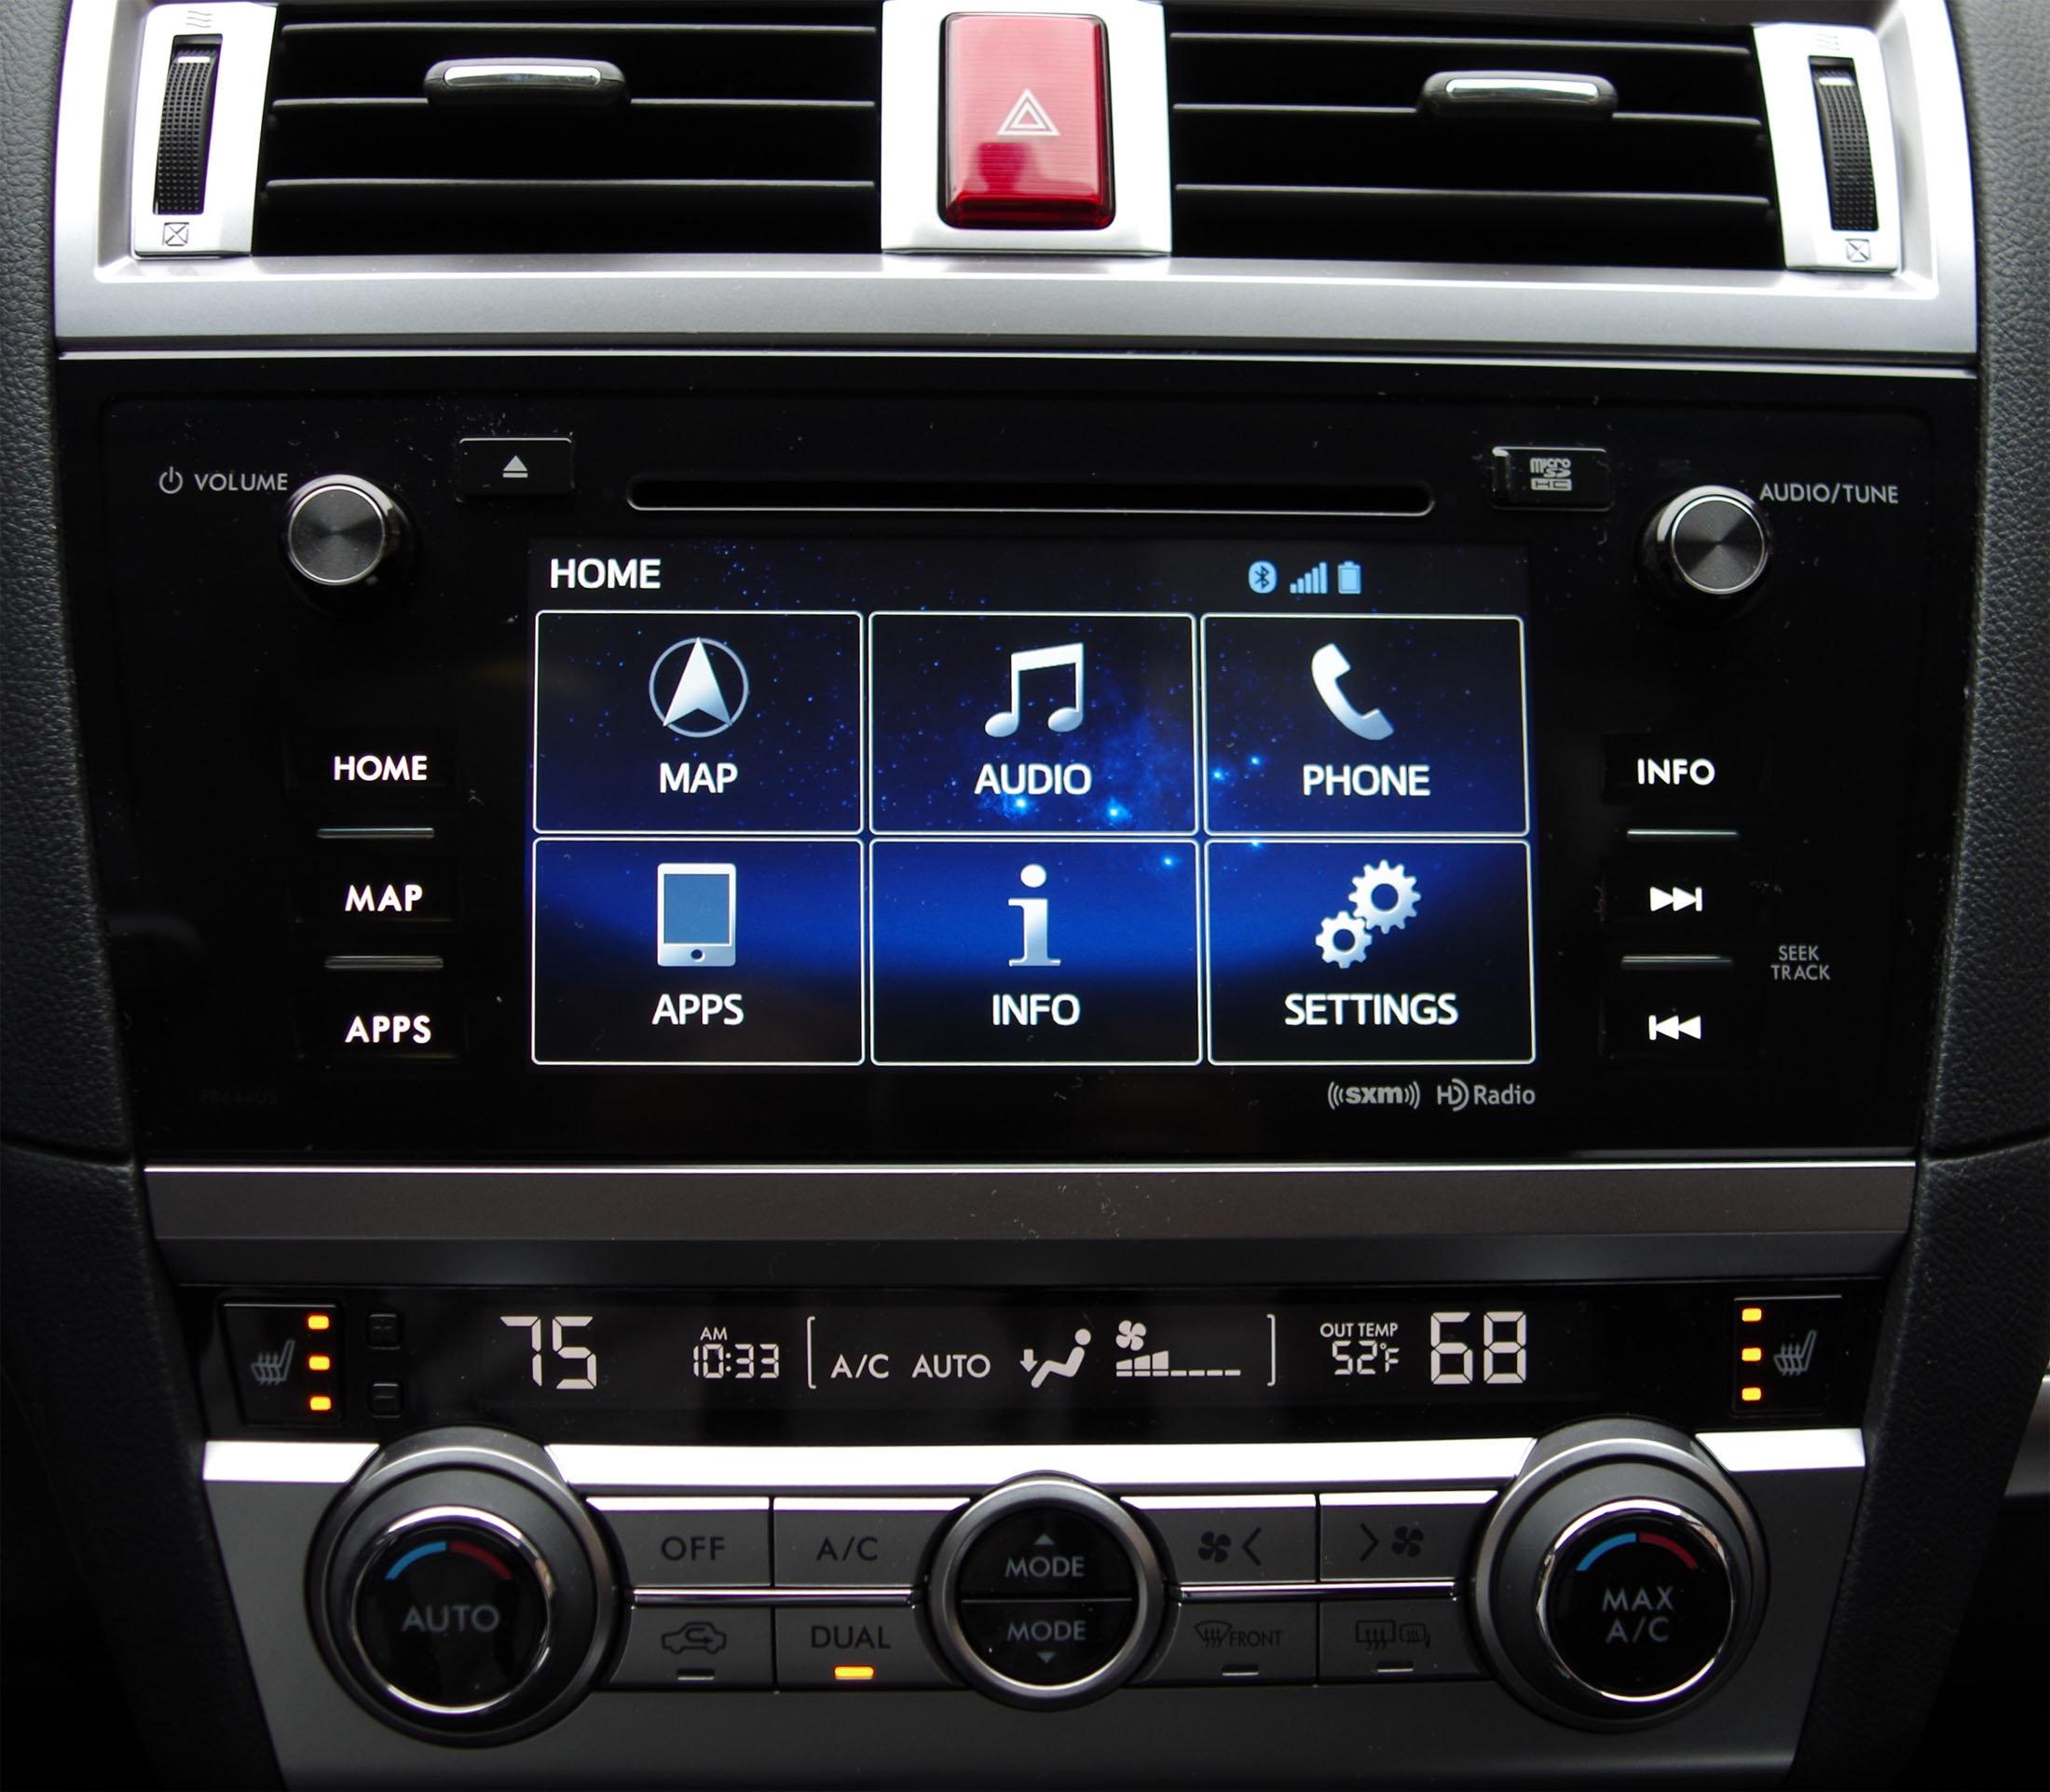 2015 Subaru Outback infotainment main menu